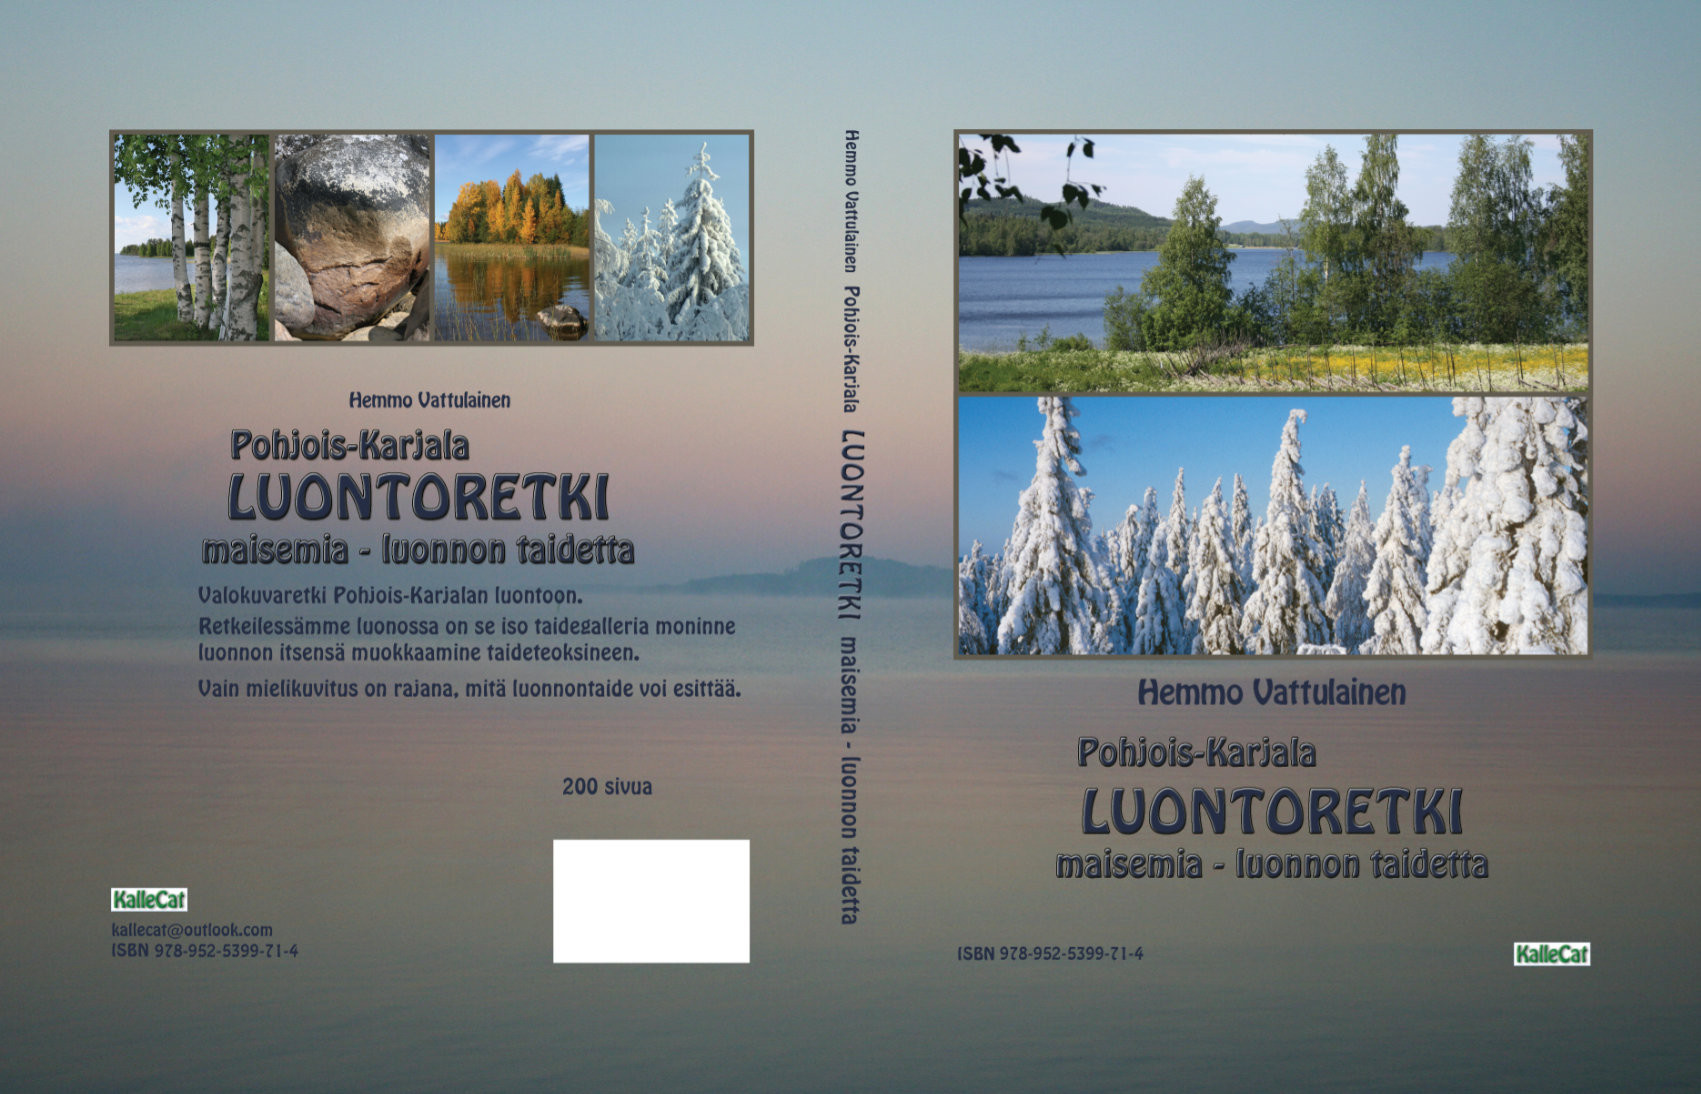 Pohjois-Karjala Luontoretki